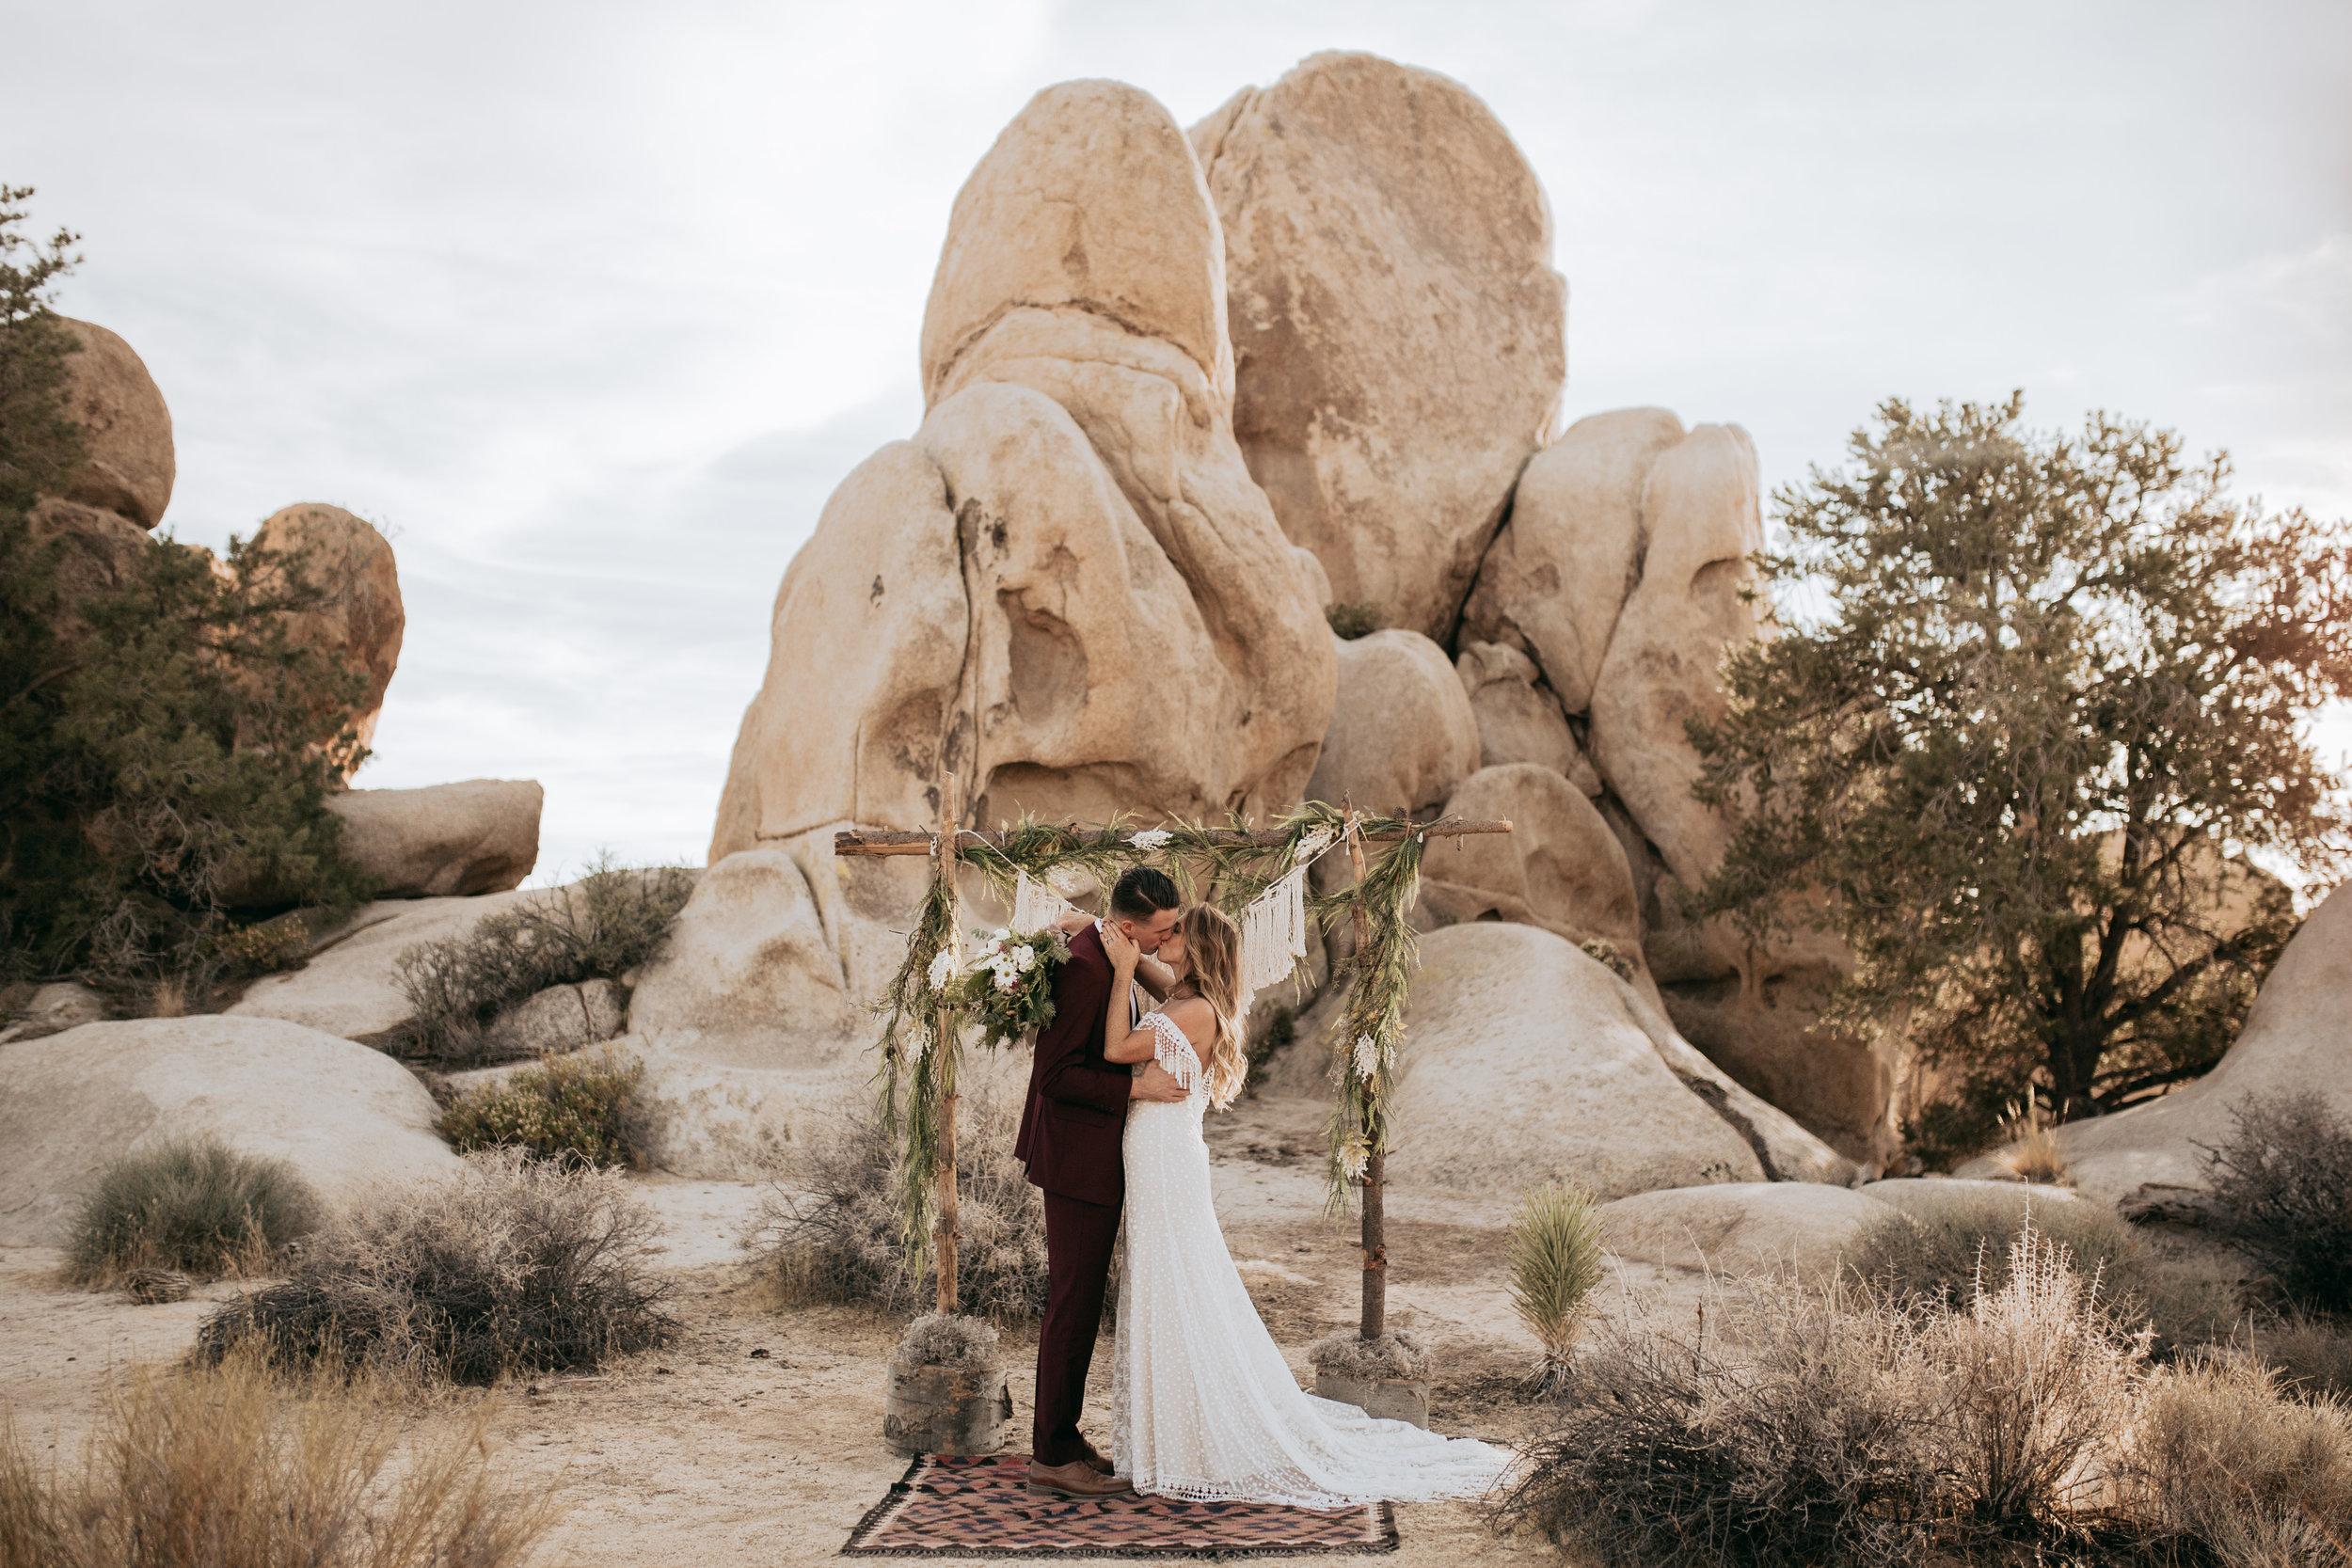 palmsprings_joshuatree_california_wedding_photographer-13.jpg